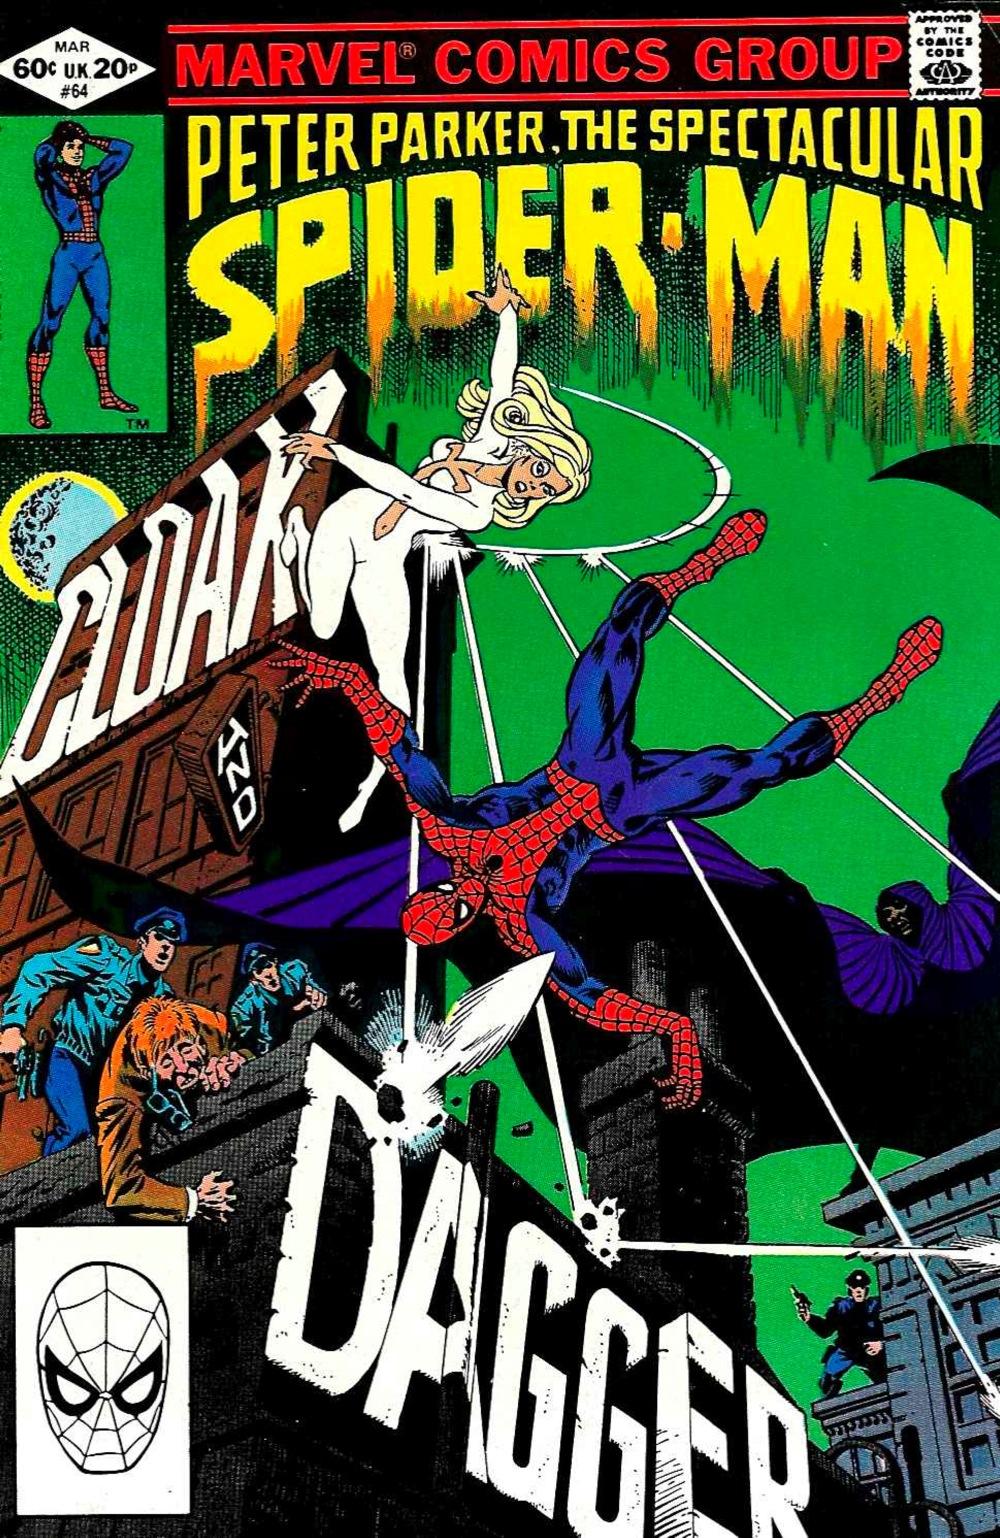 Peter Parker the Spectacular Spider-Man #64, copertina di Bill Mantlo